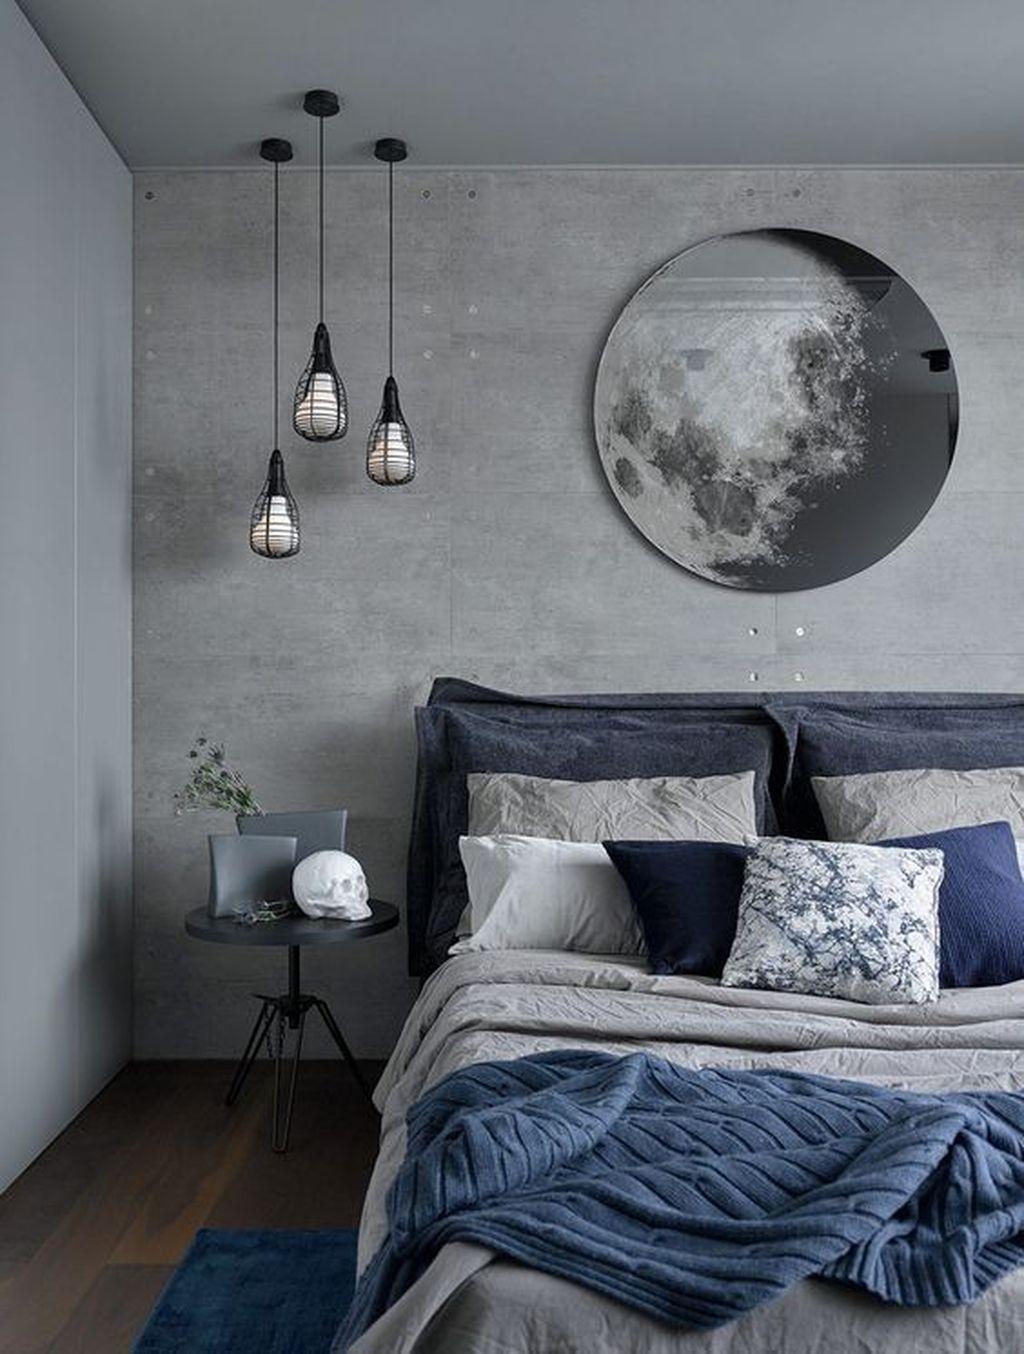 Inspiring Navy Blue Bedroom Decor Ideas You Should Copy 09